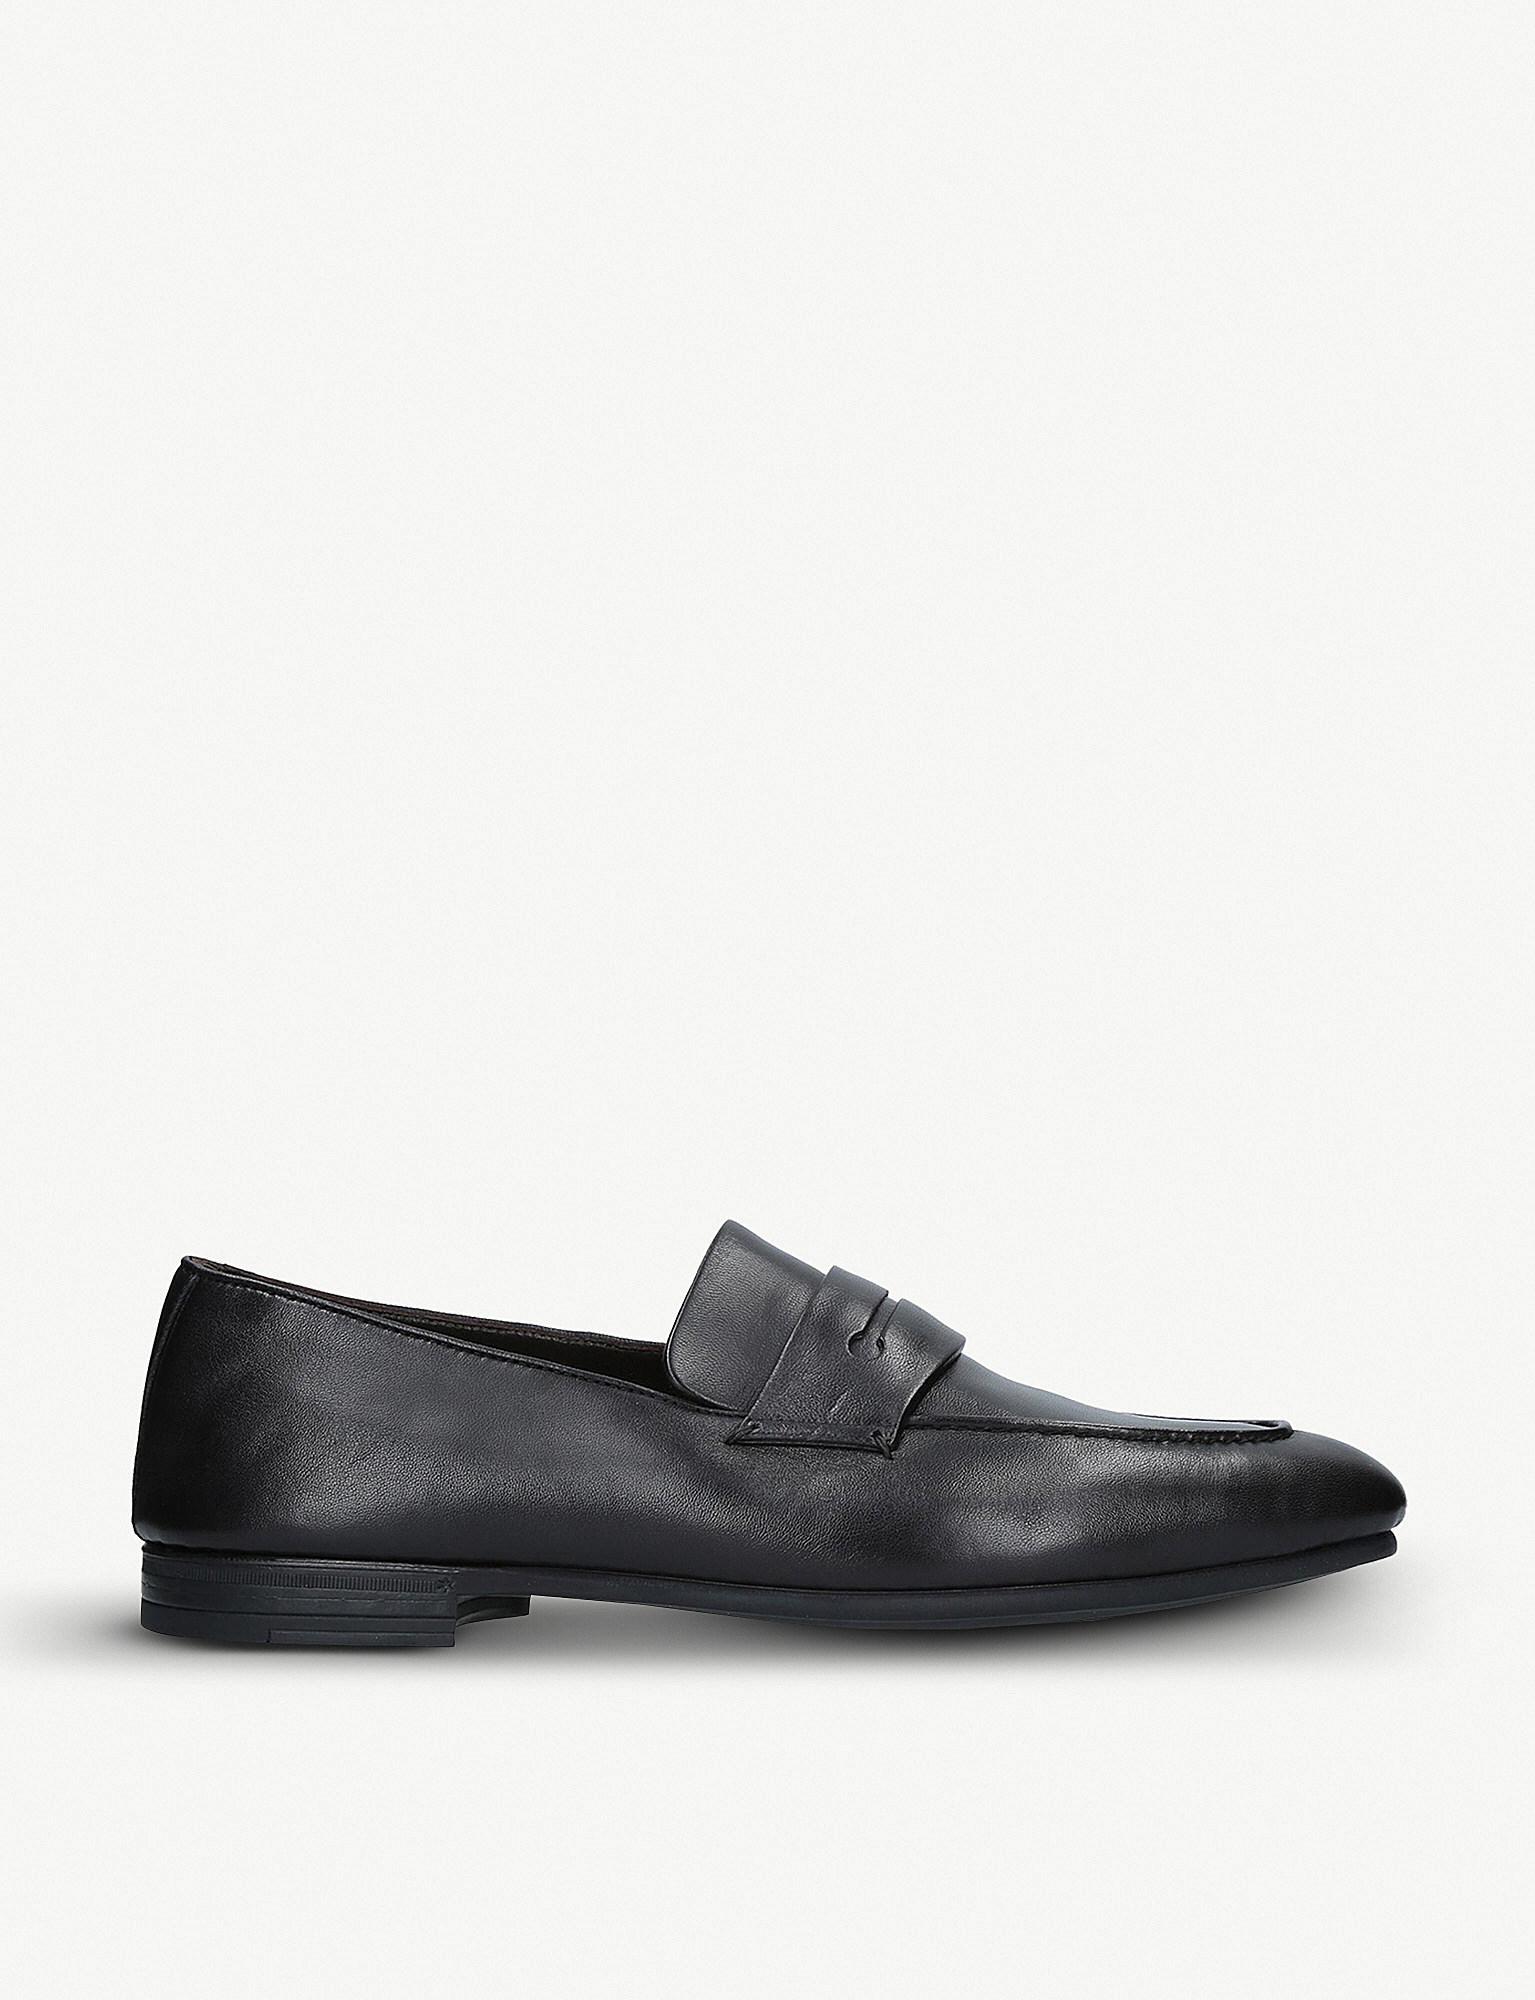 cb04554cbdc Lyst - Ermenegildo Zegna Asola Leather Penny Loafers in Black for Men